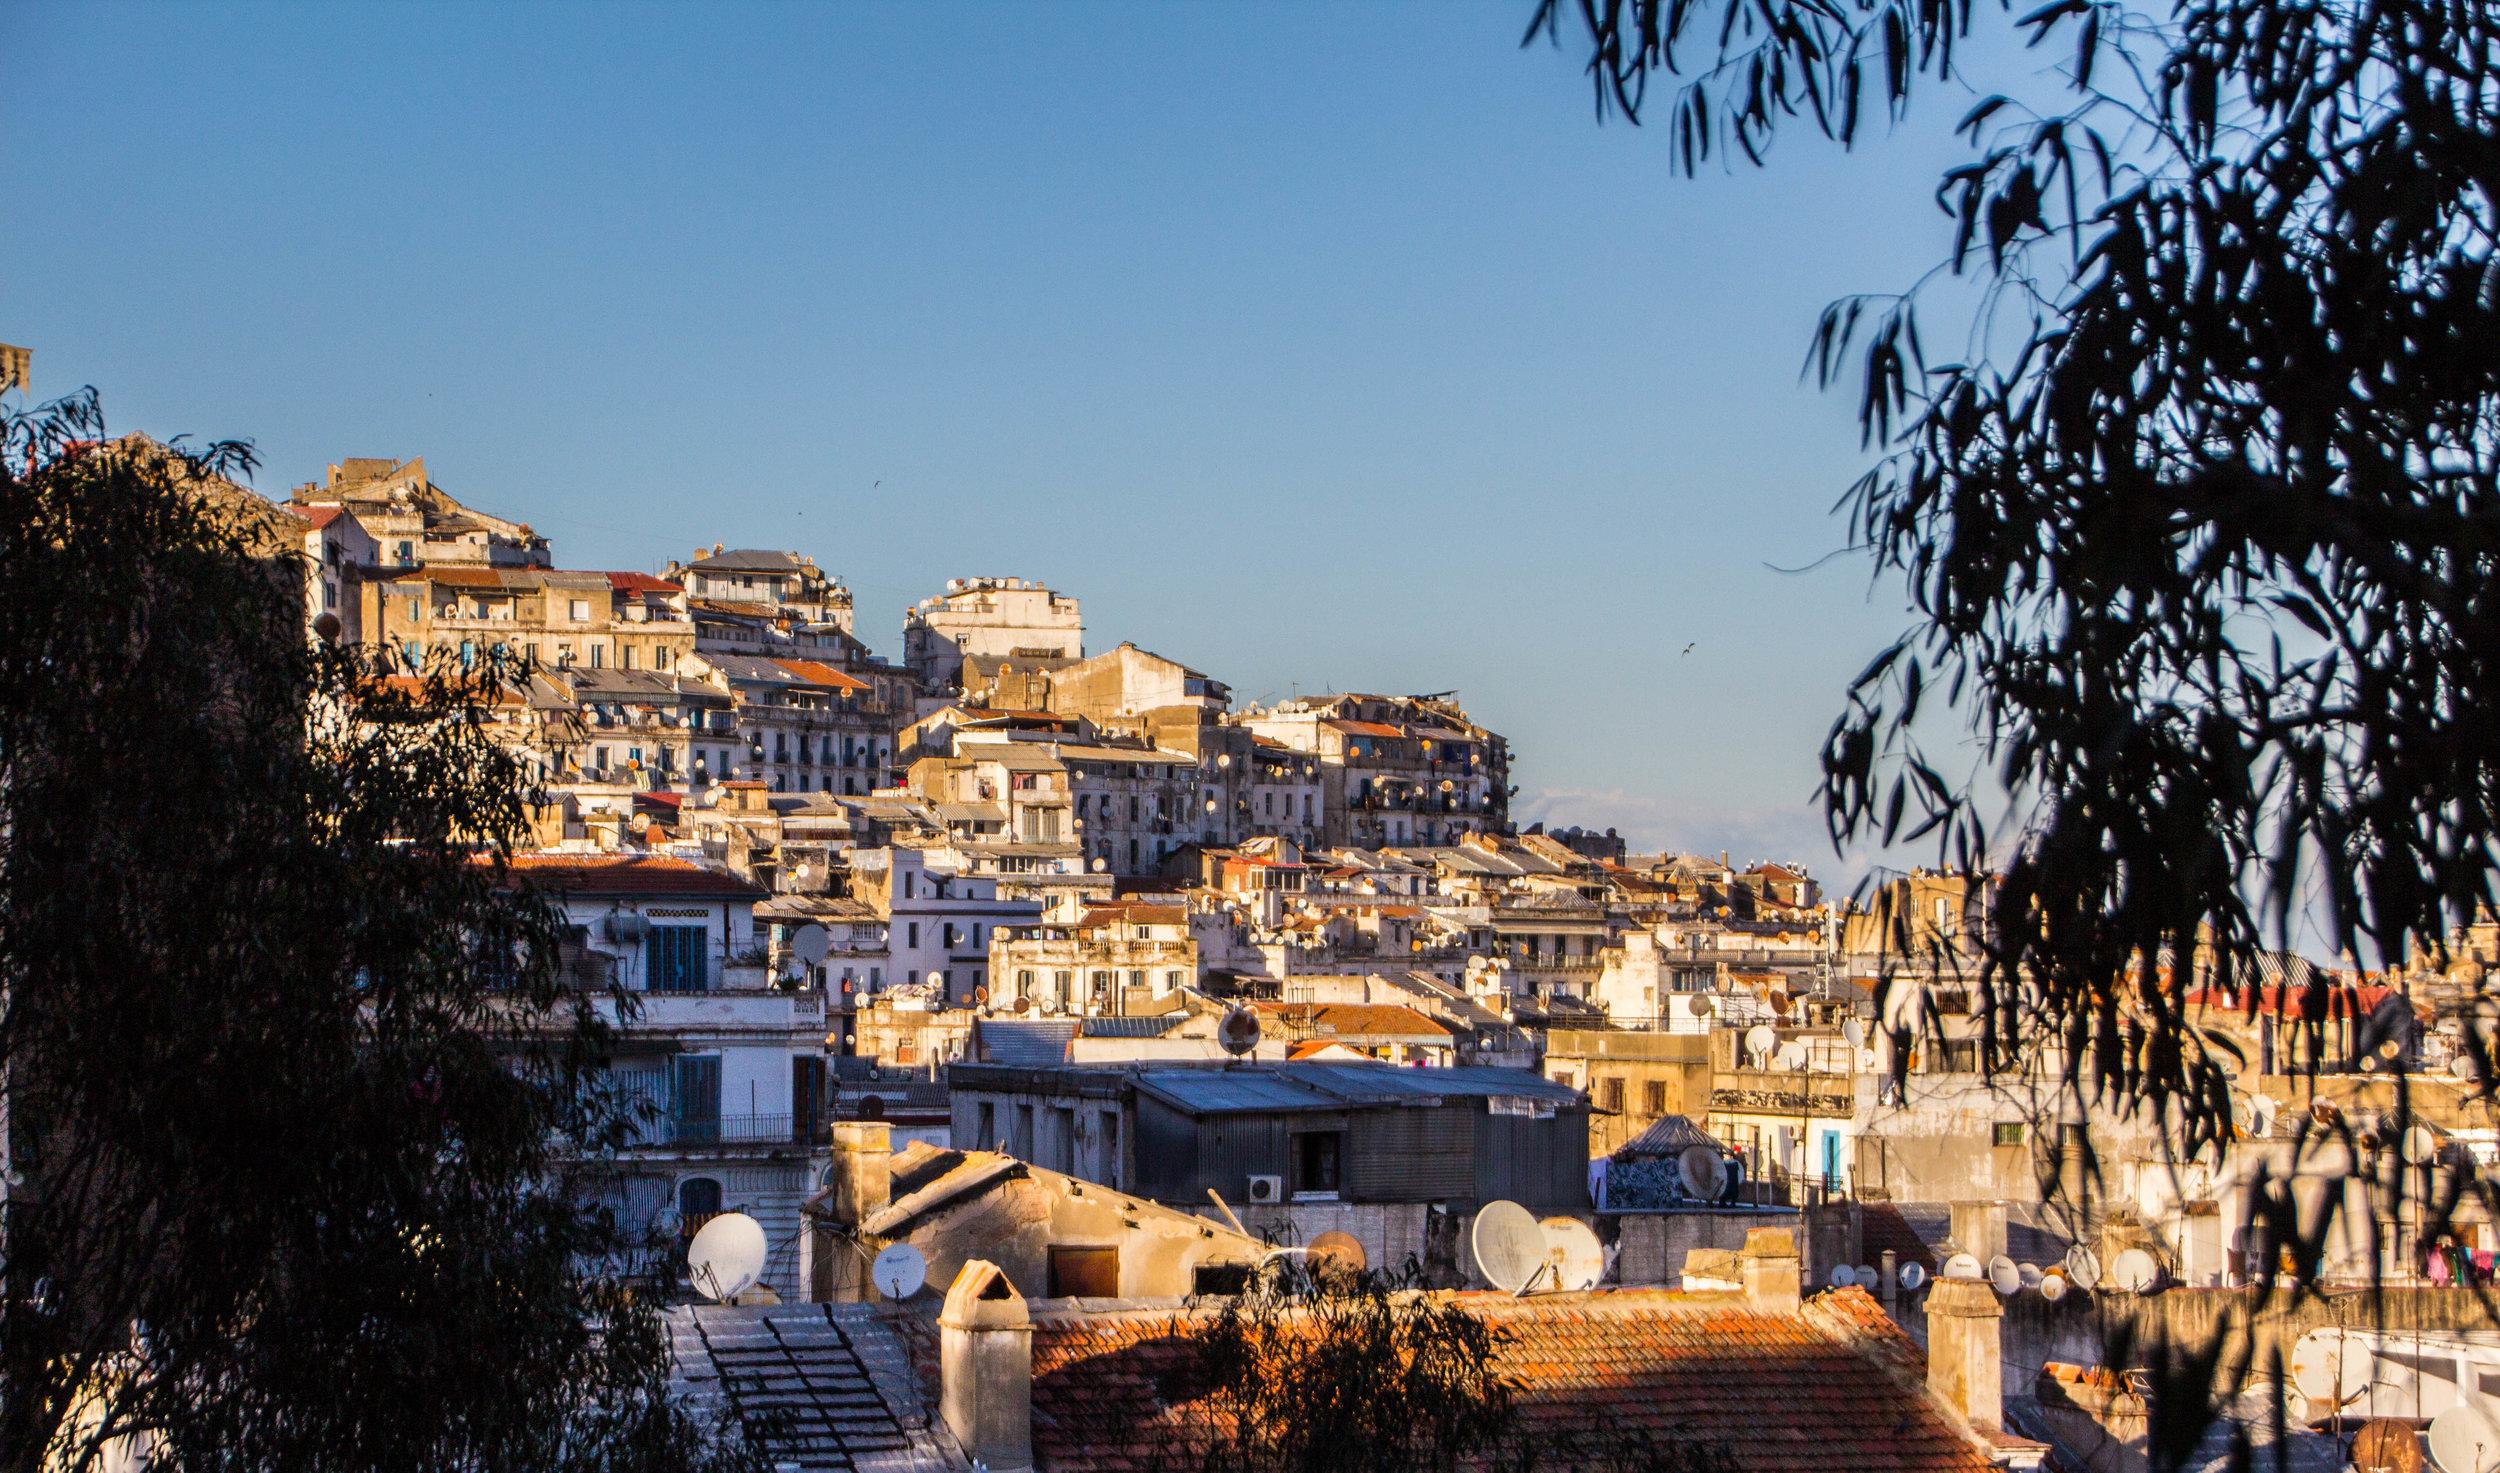 streets-algiers-algeria-16-2.jpg